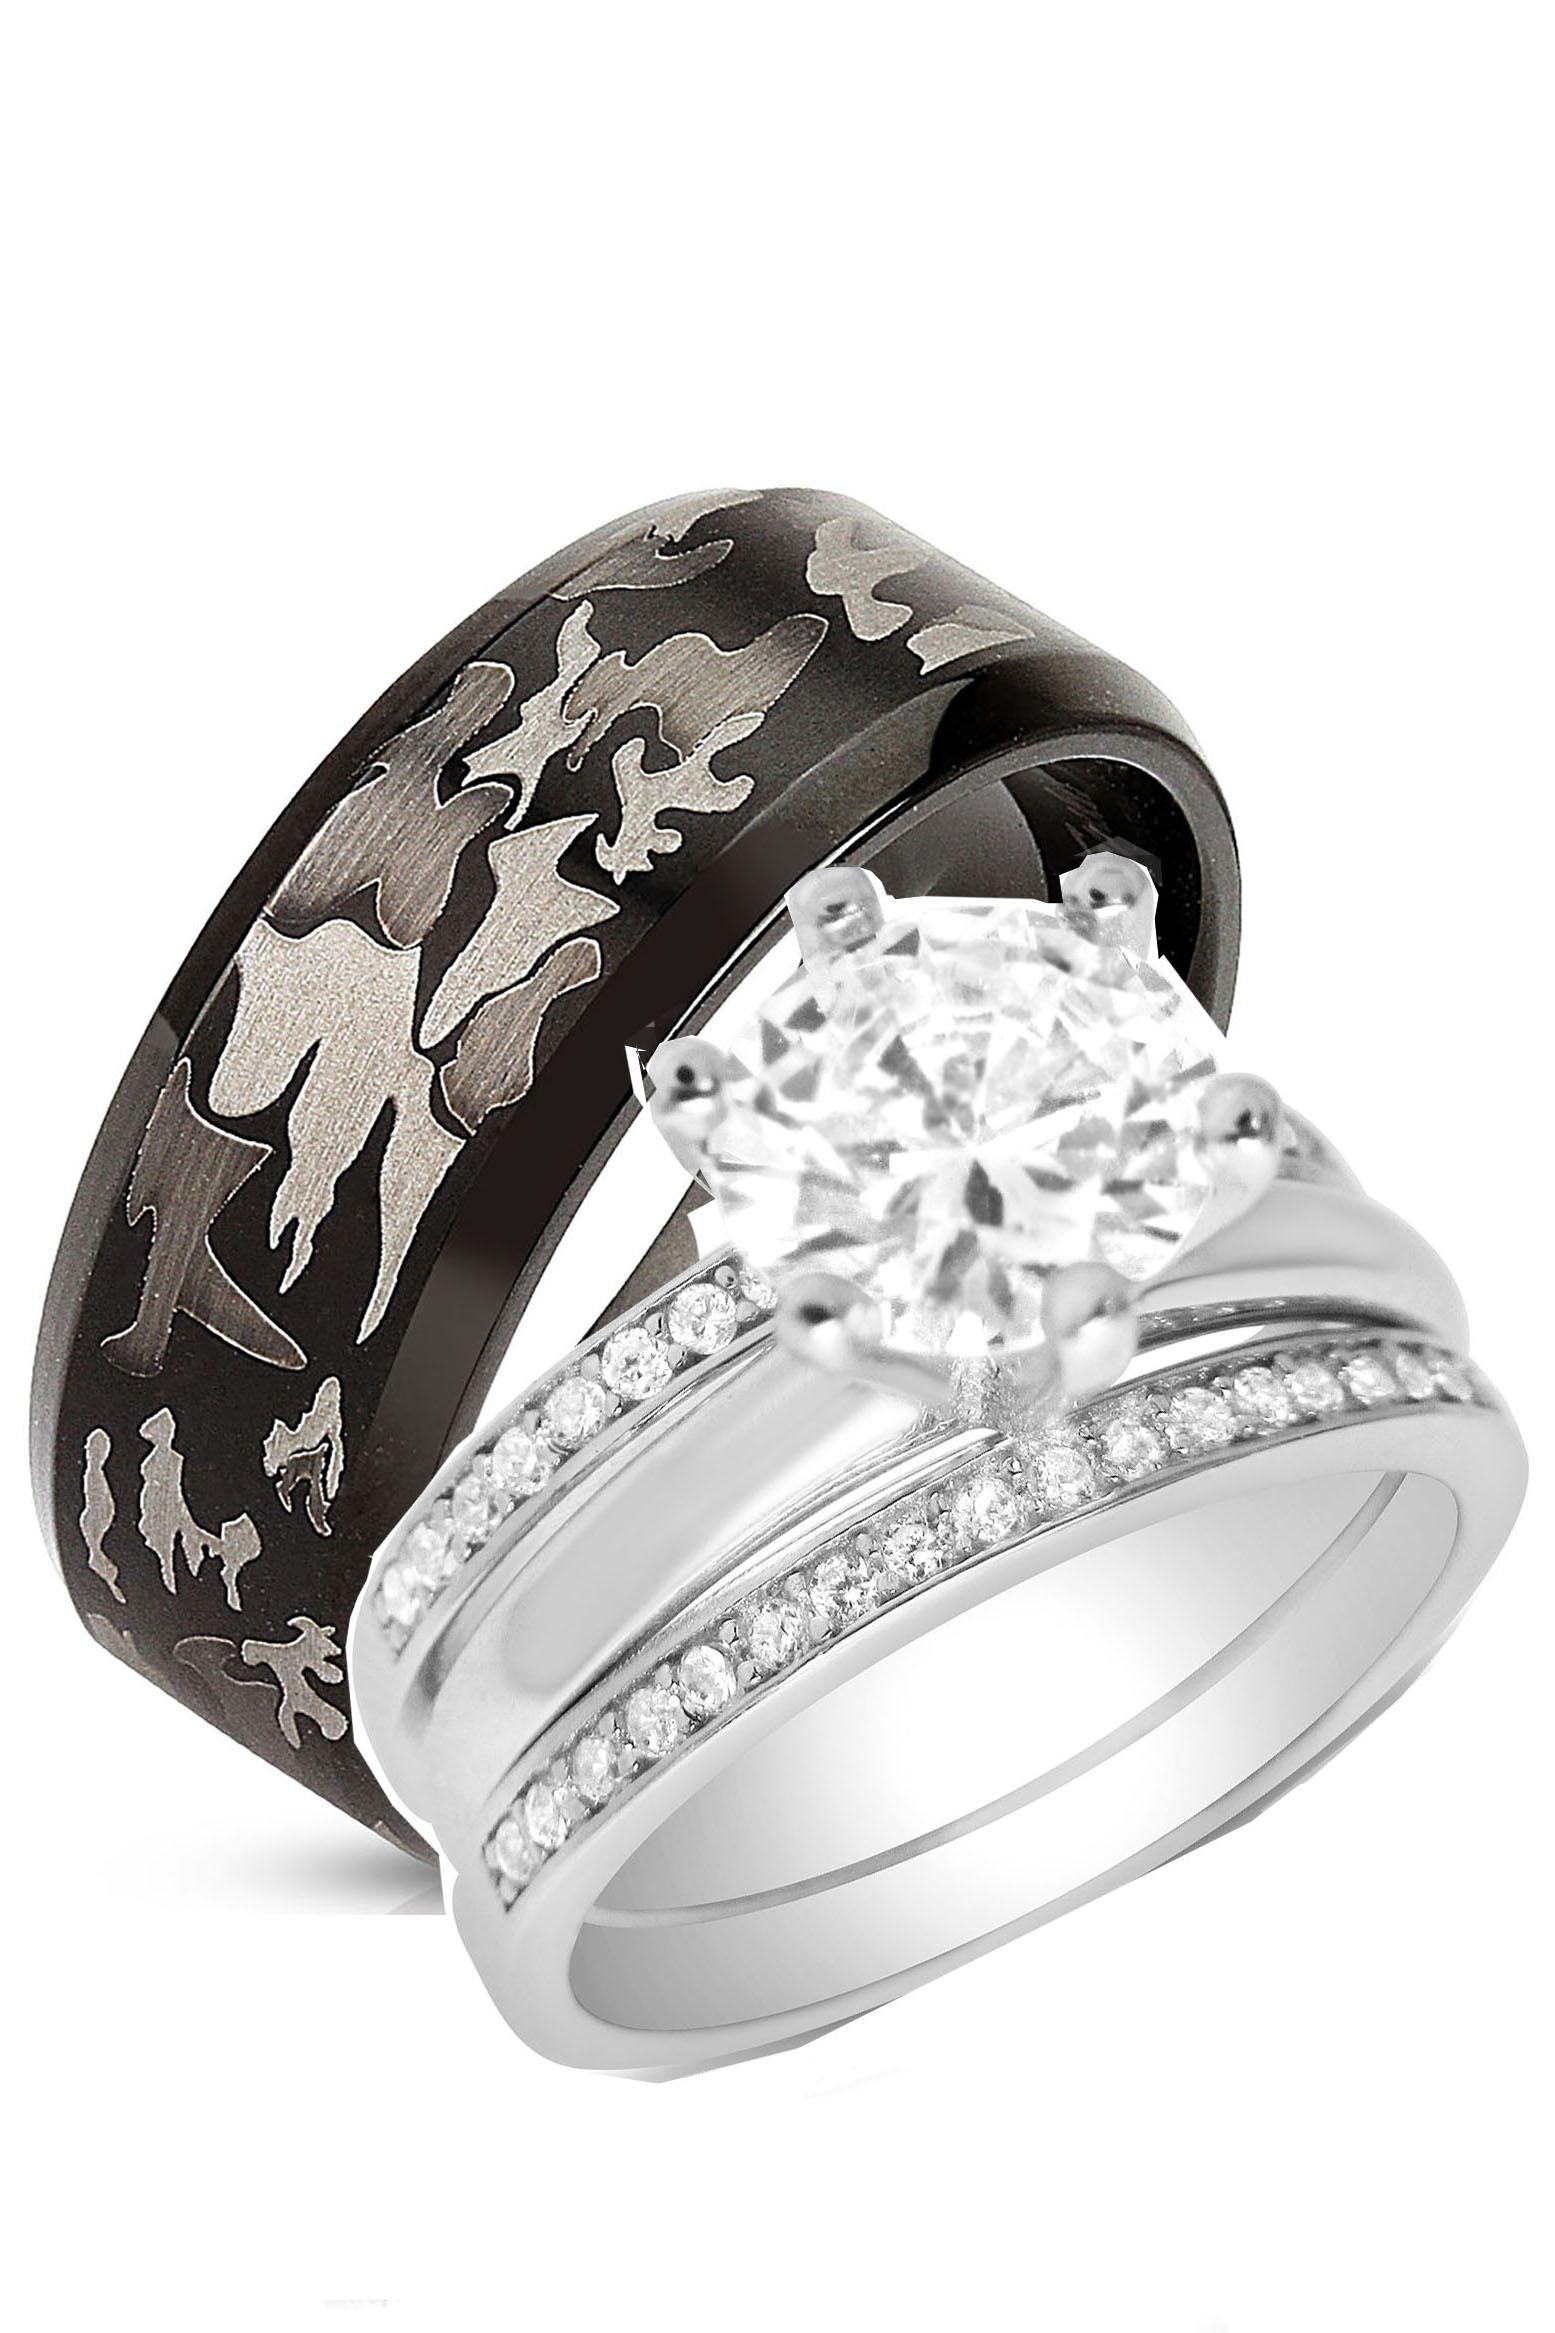 Laraso Co His Her Sterling Silver 1 Carat Cz Bridal Set